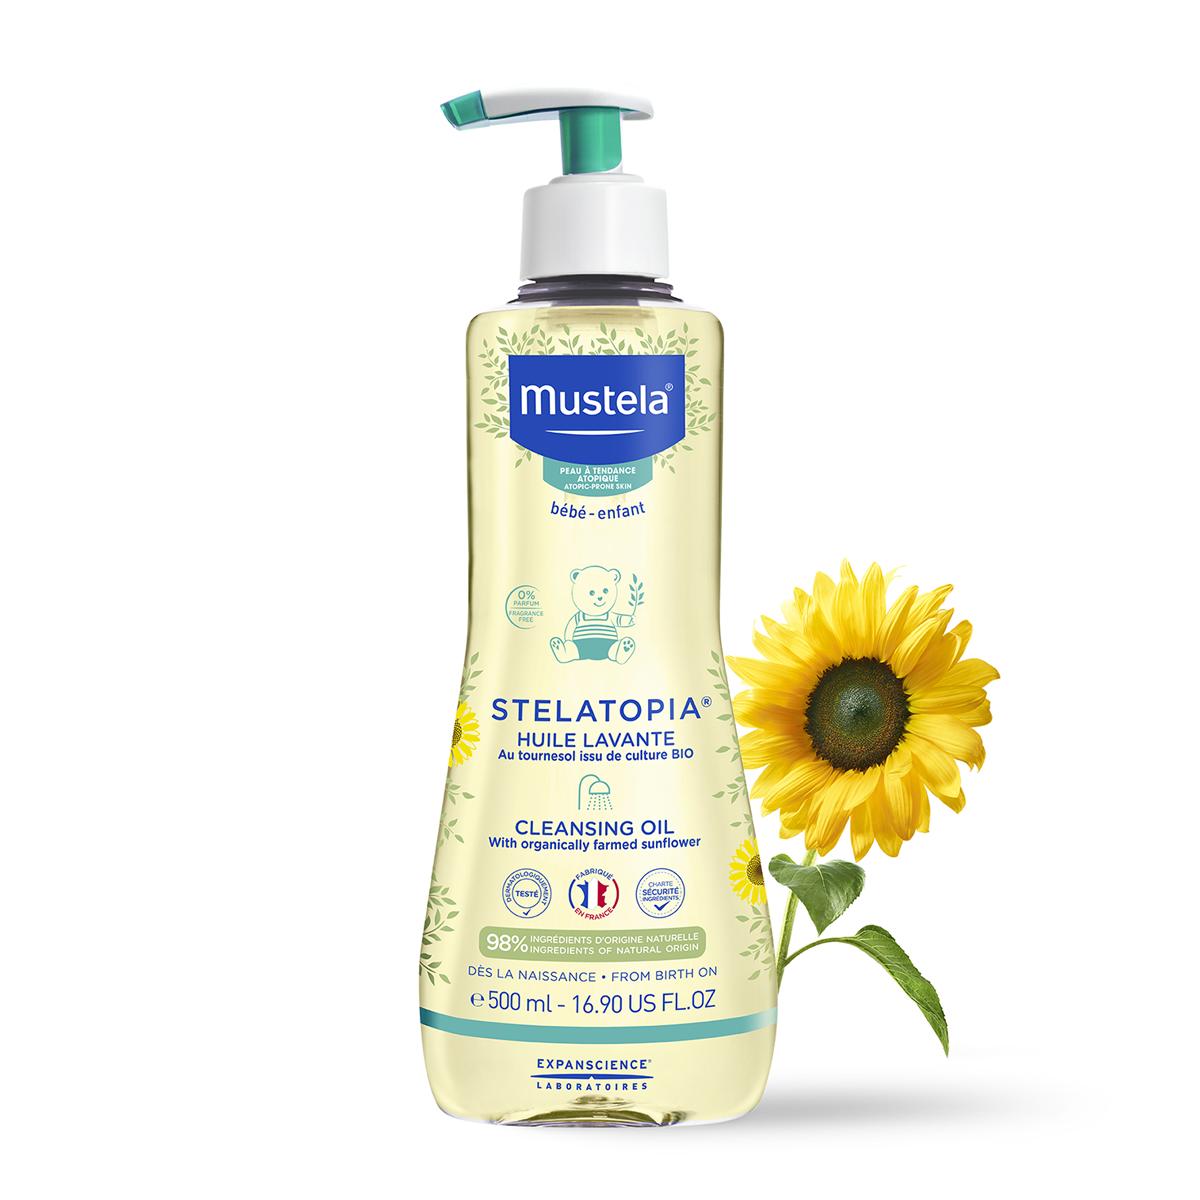 Mustela Stelatopia Cleansing Oil Atopic Skin Fragrance-Free 500ml